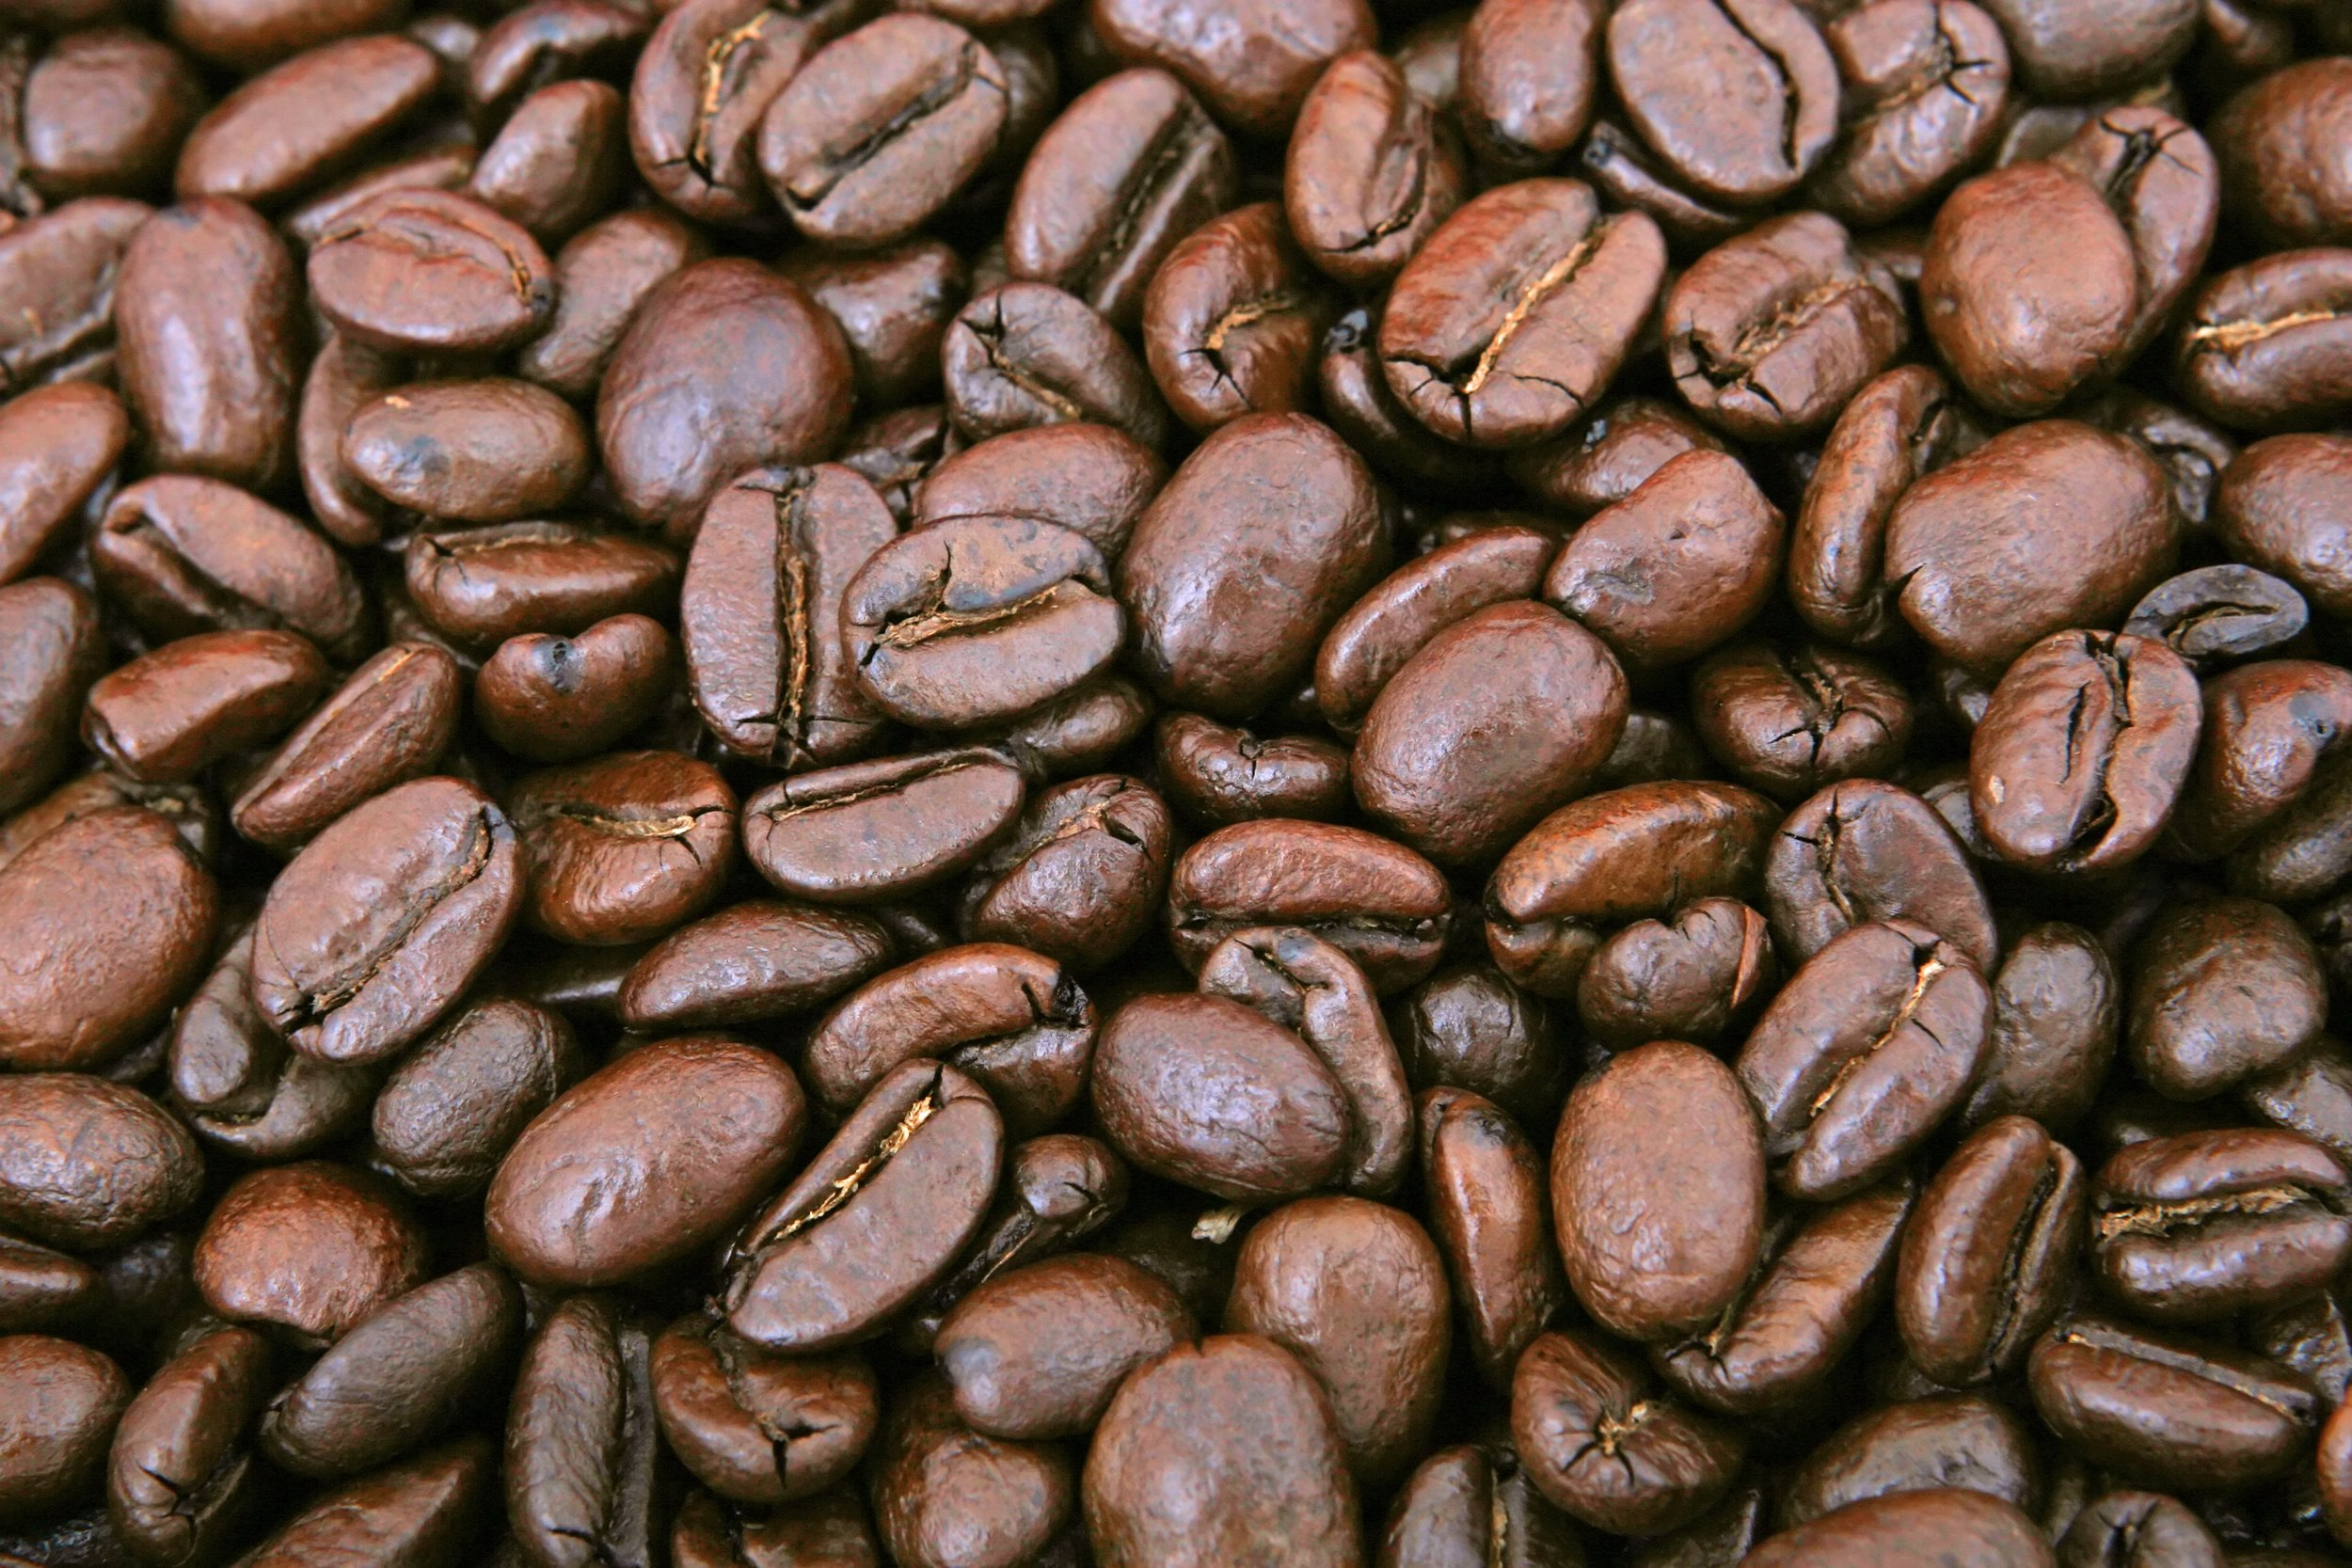 World famous Columbian Coffee